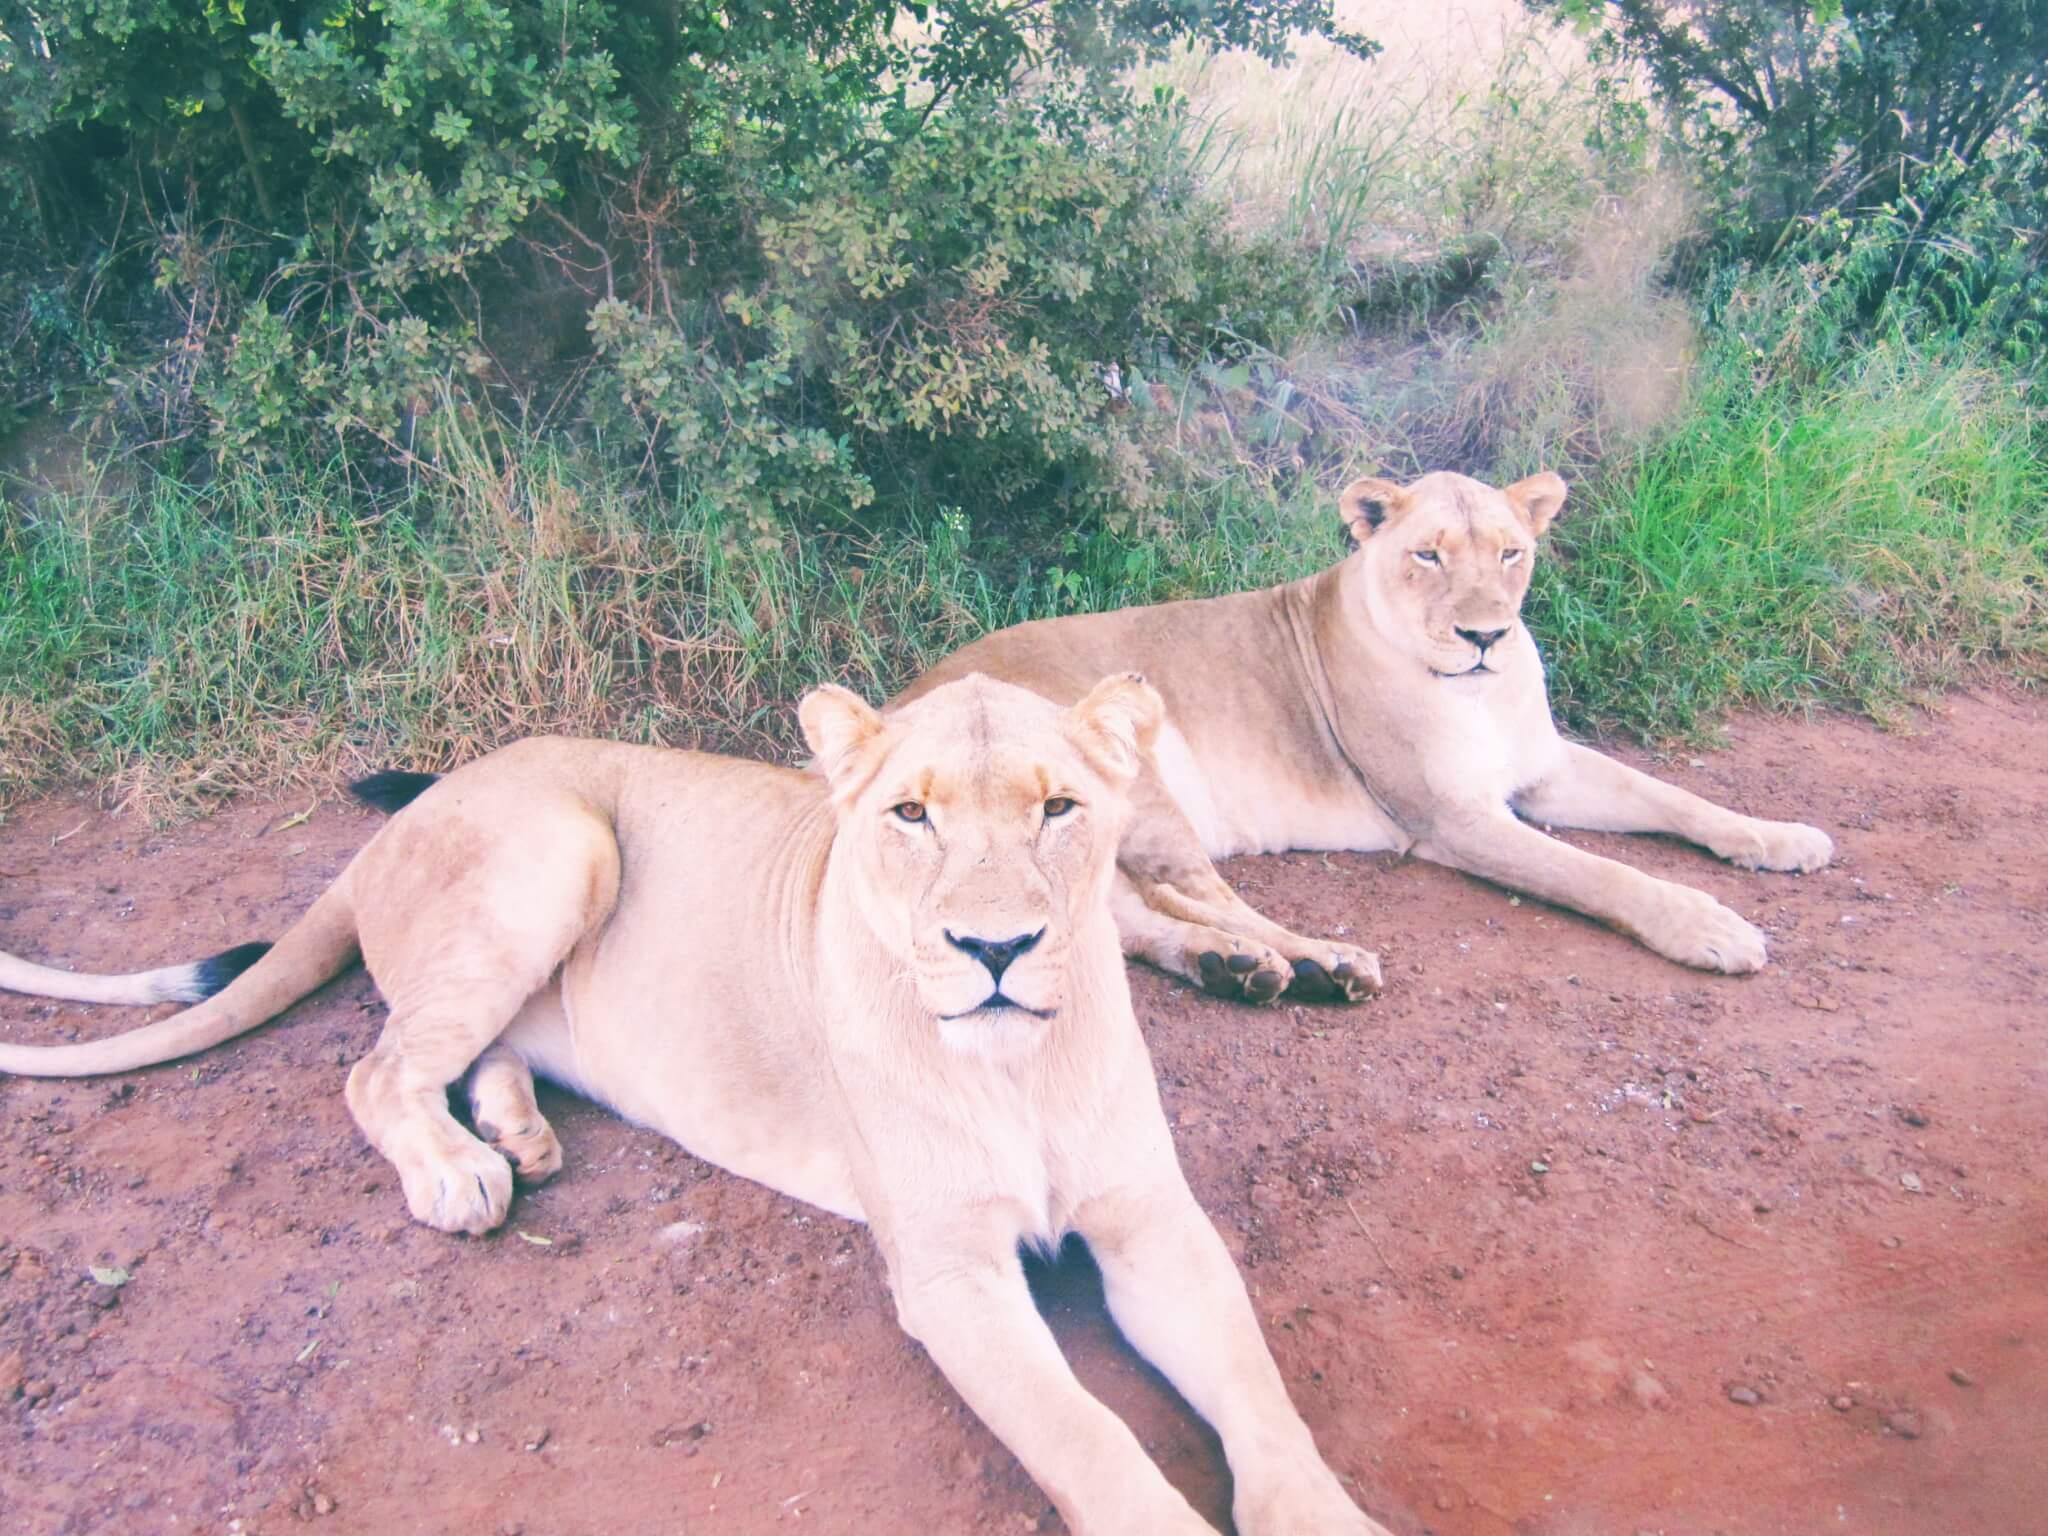 sustainable-animal-tourism-alternatives